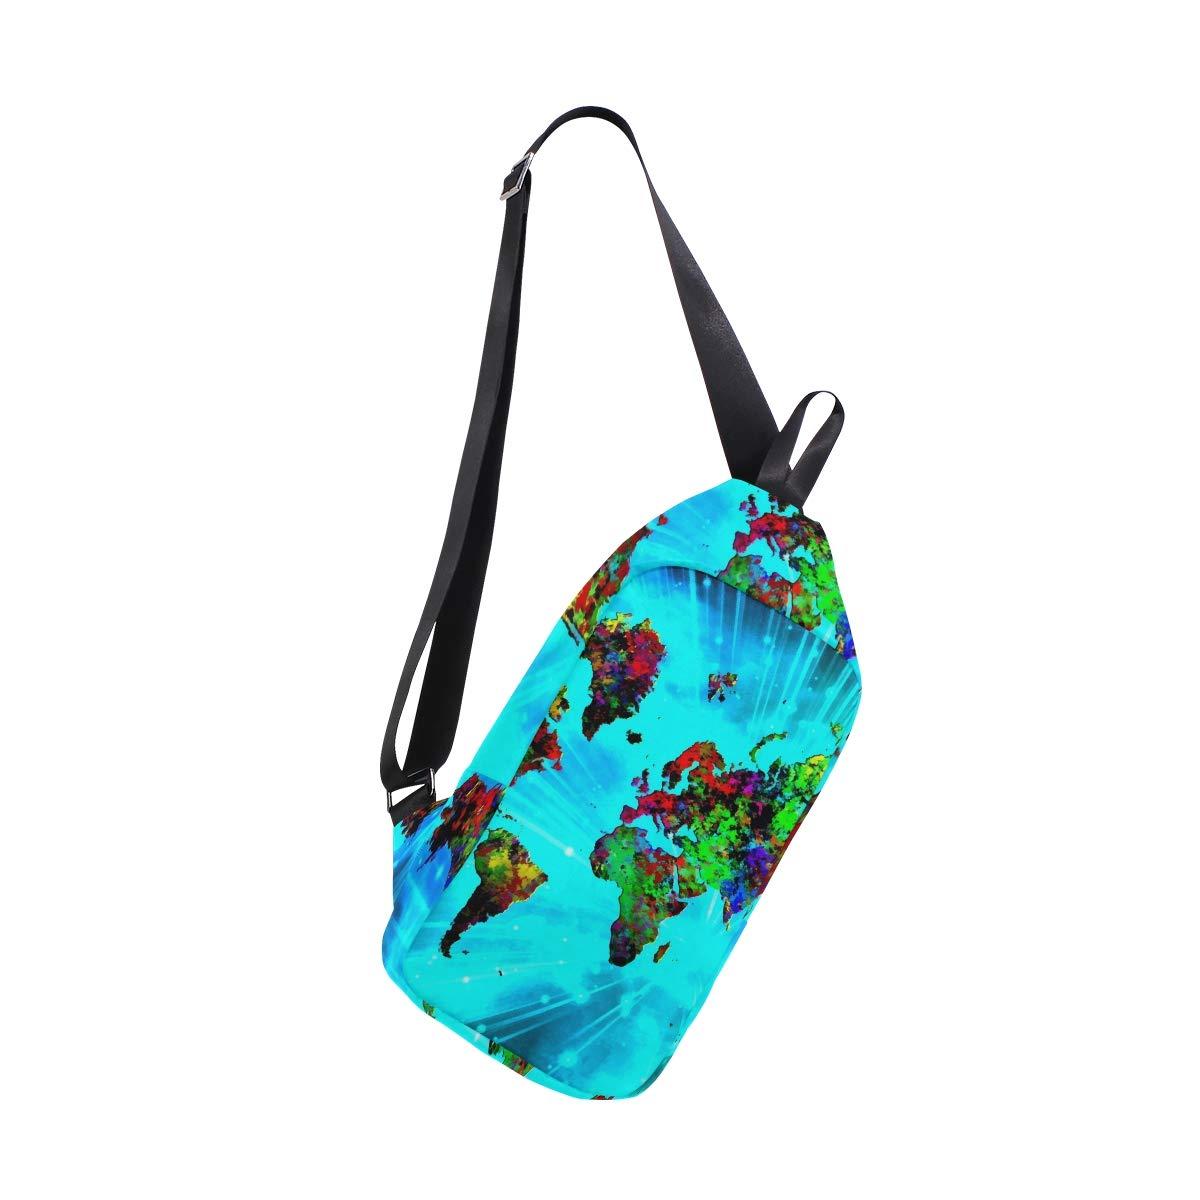 AHOMY Colorful World Map Messenger Bag Small Travel School Sling Bag Crossbody Bag